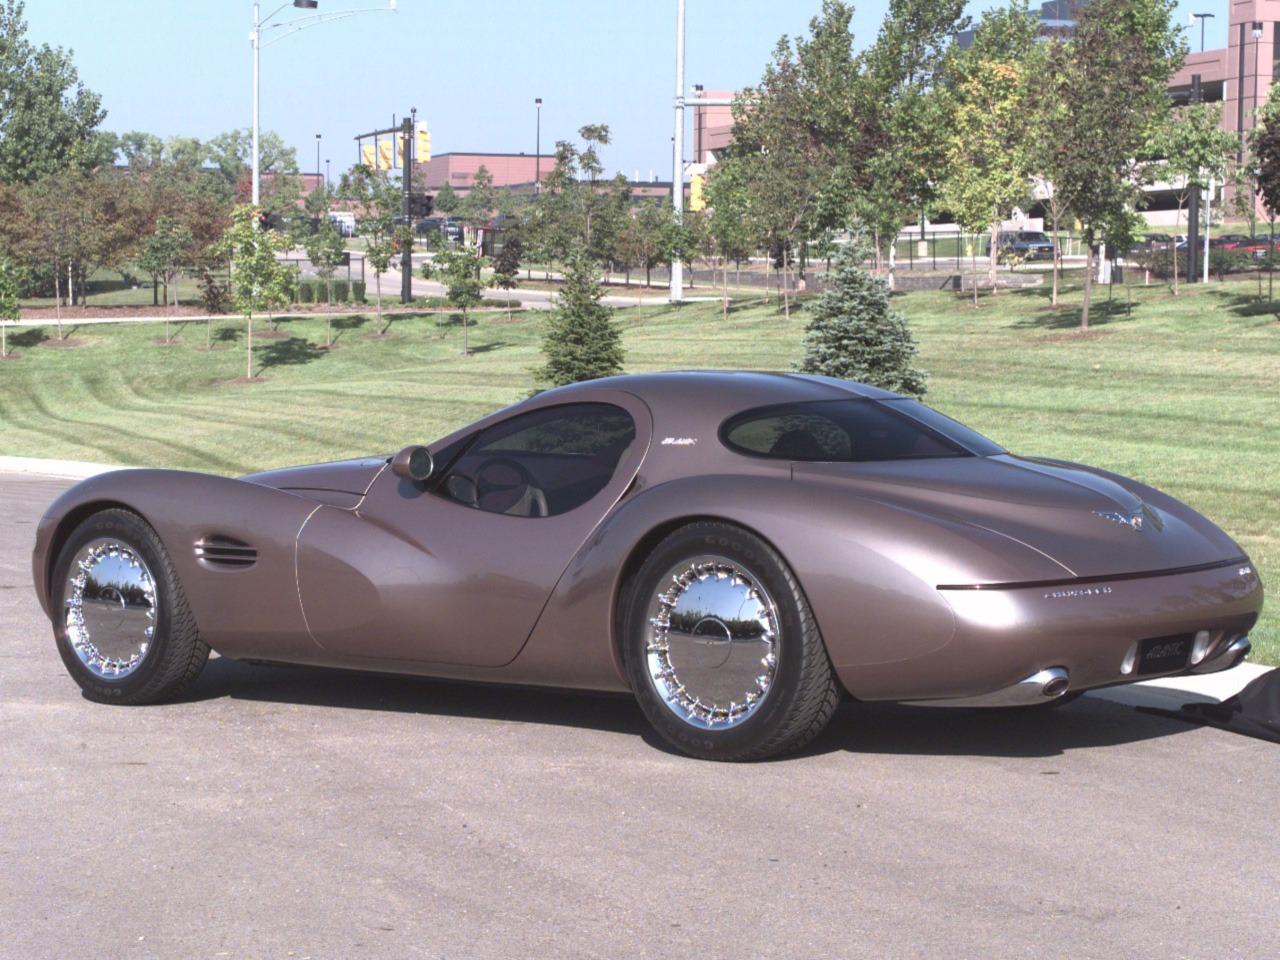 Chrysler Atlantic Concept 1995 Old Concept Cars